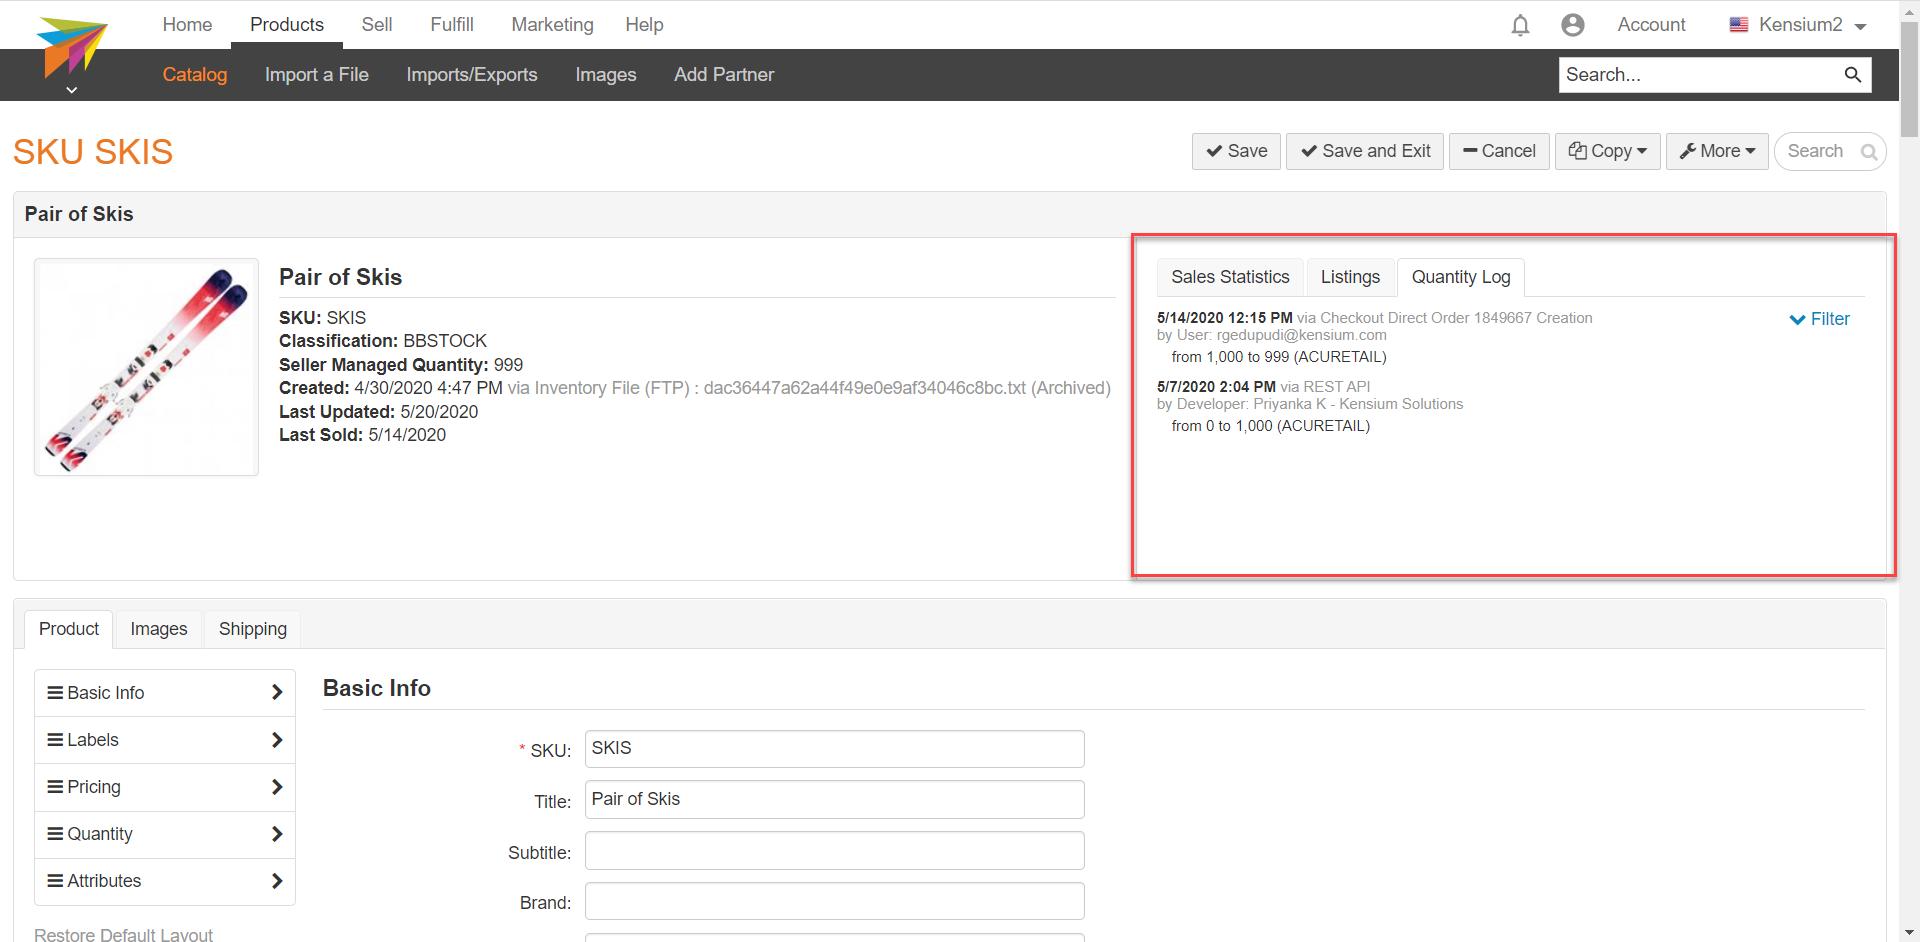 Quantity Log on a Stock Item In ChannelAdvisor